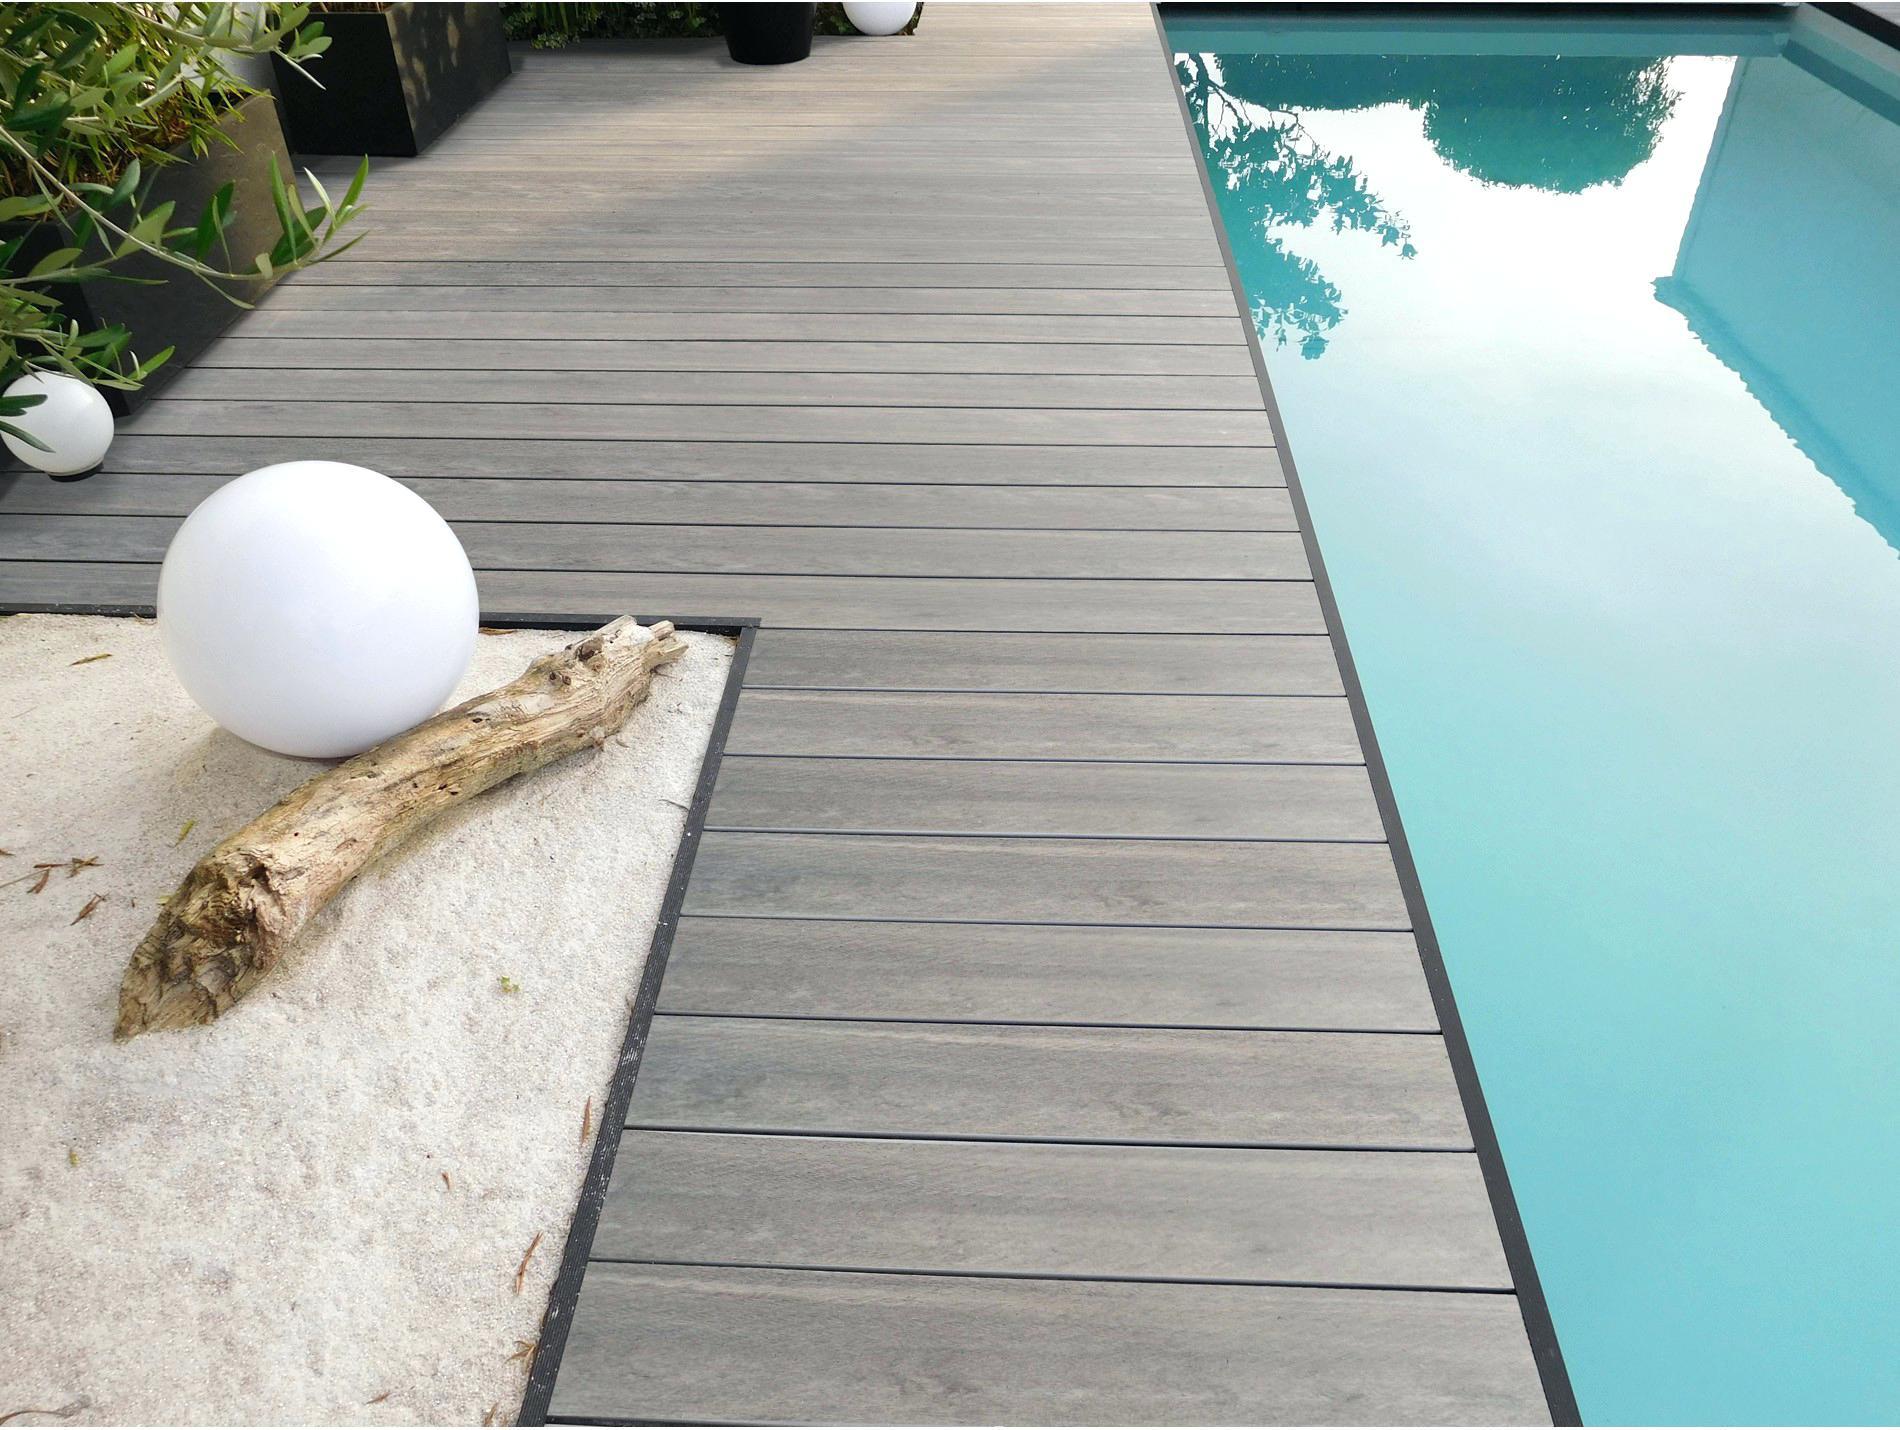 lame de terrasse composite nods gris avis veranda. Black Bedroom Furniture Sets. Home Design Ideas